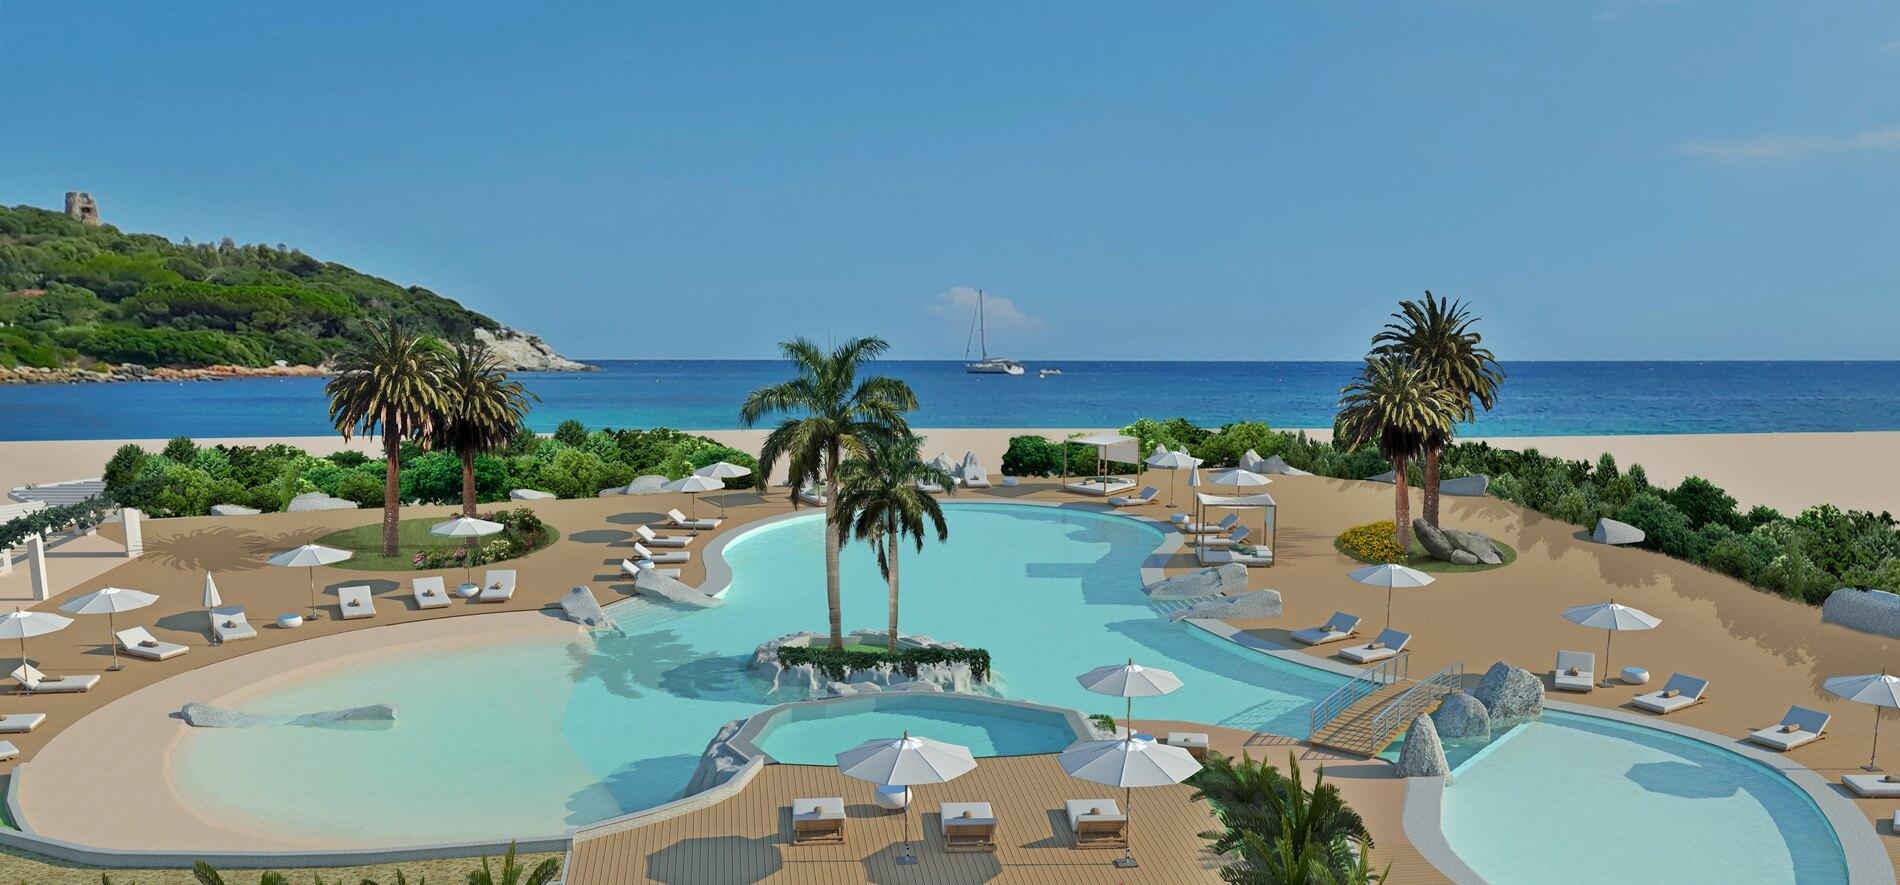 _hotel_club_saraceno_resort_con_piscina_sardegna_07